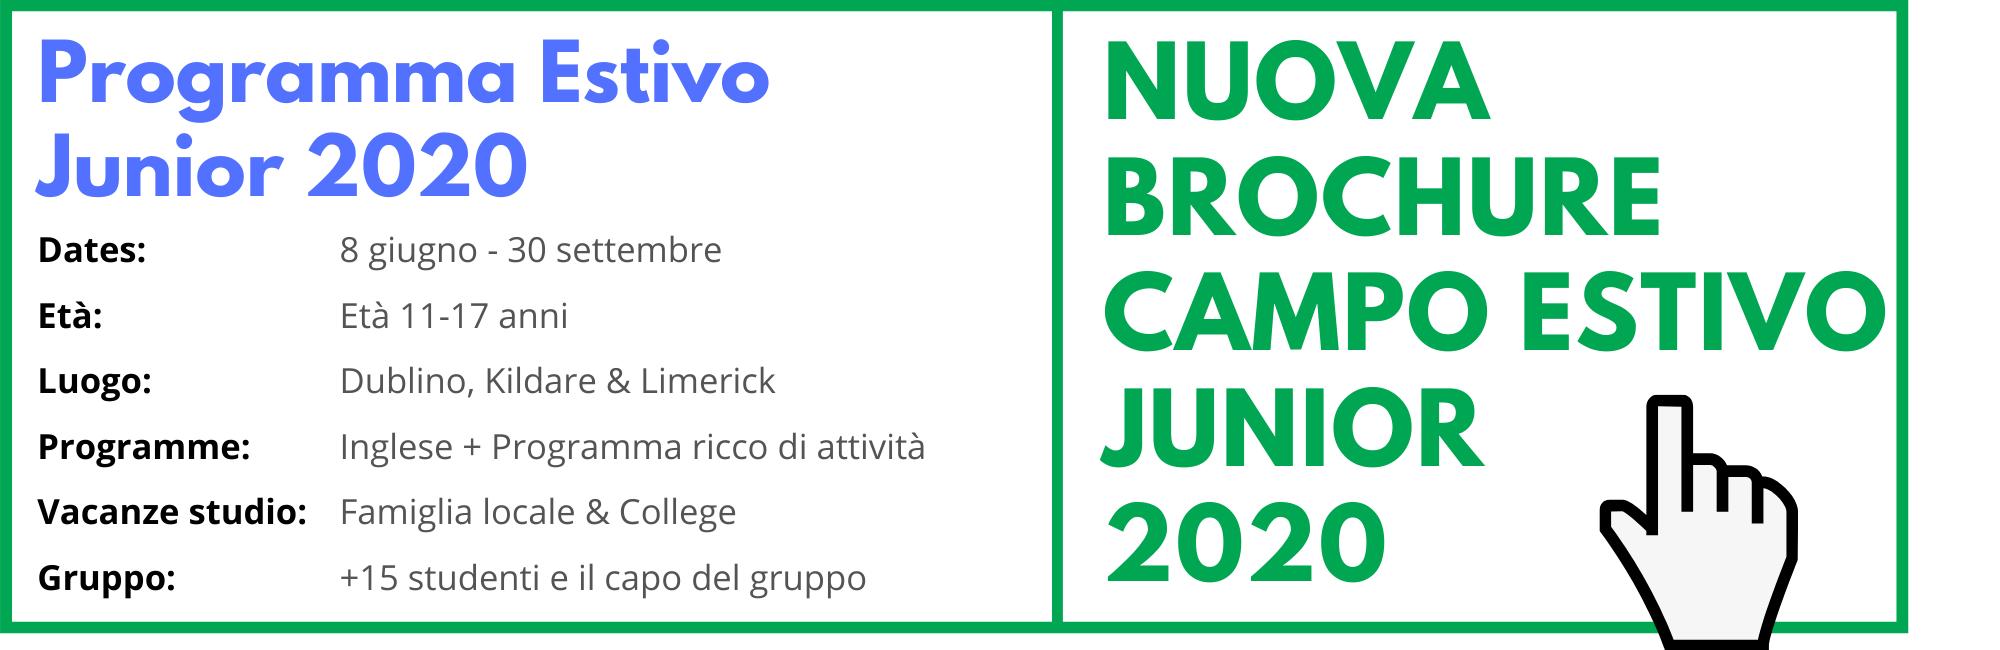 Programma Estivo Junior 2020